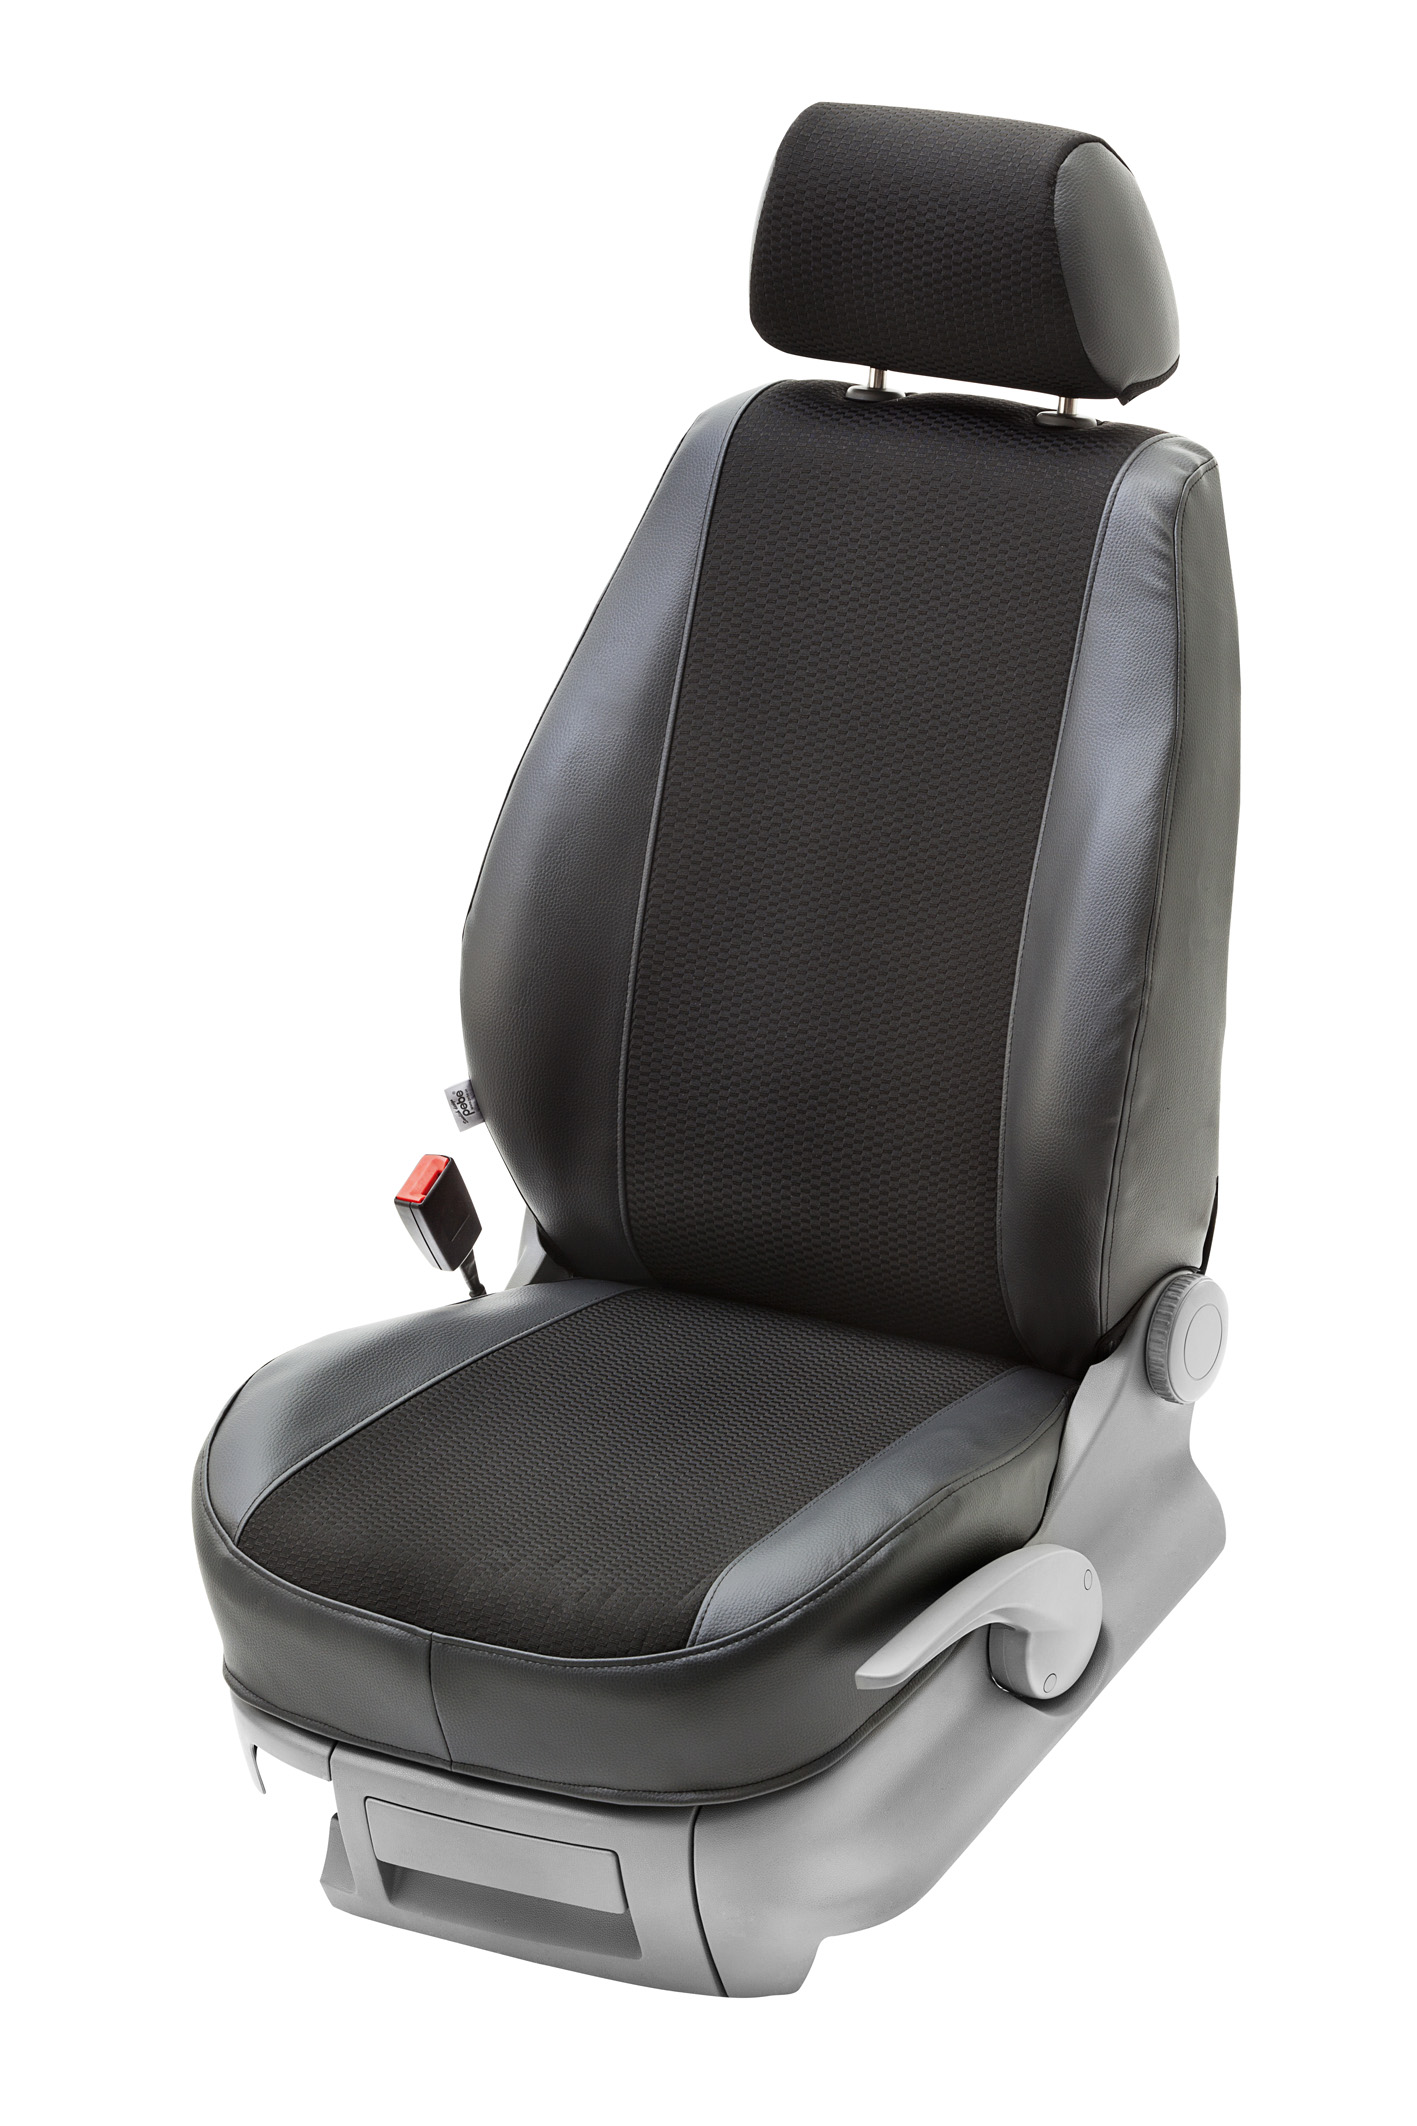 Istuinsuoja Transport 3.0 Renault Kangoo 2013- 1+2 etuist.